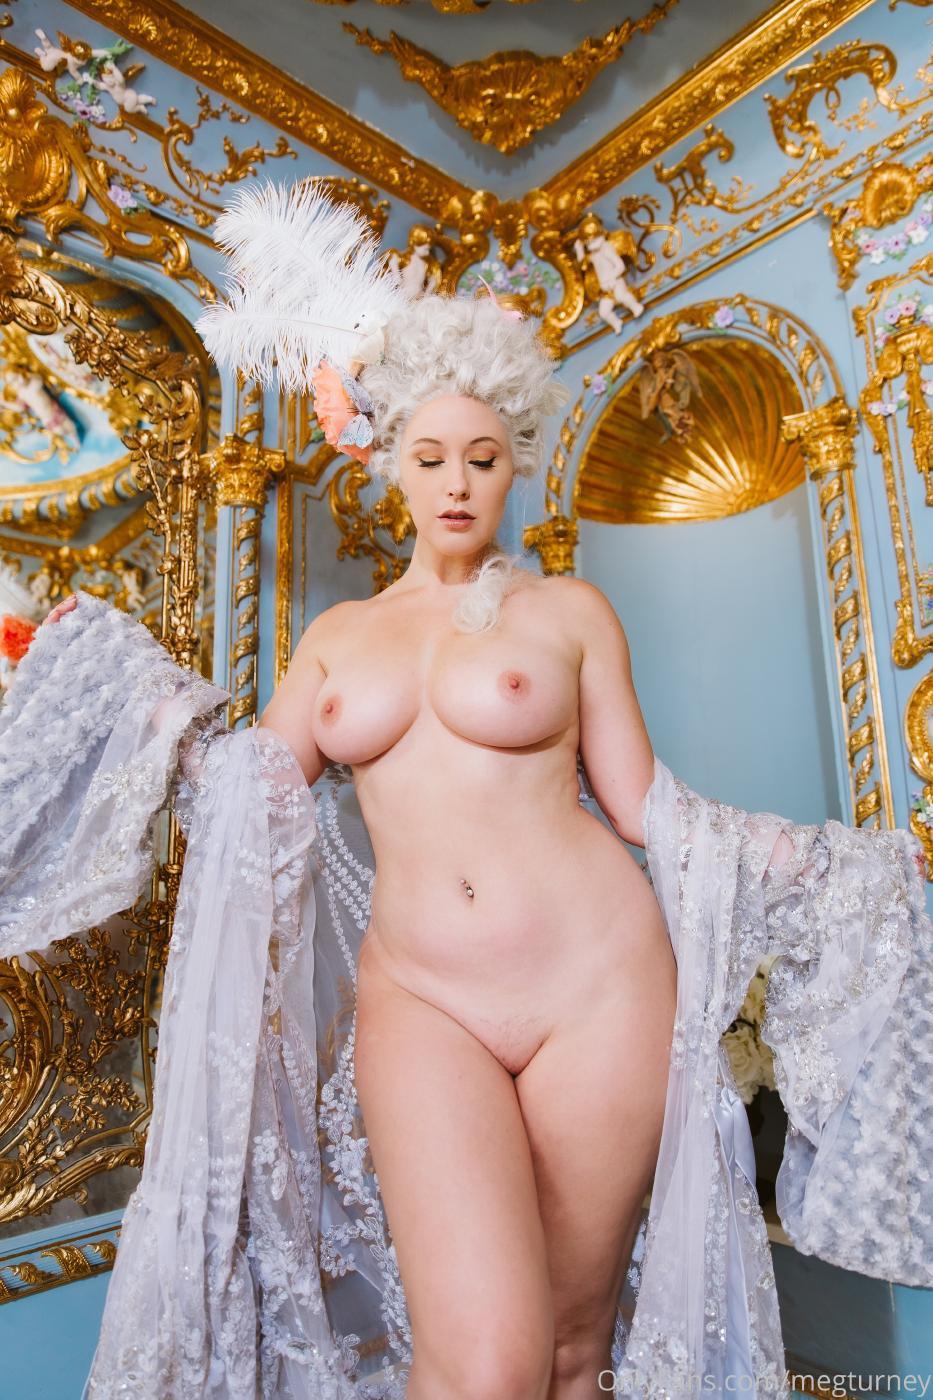 Meg Turney PPV Marie Antoinette Nude Cosplay OnlyFans Leaked Video 20